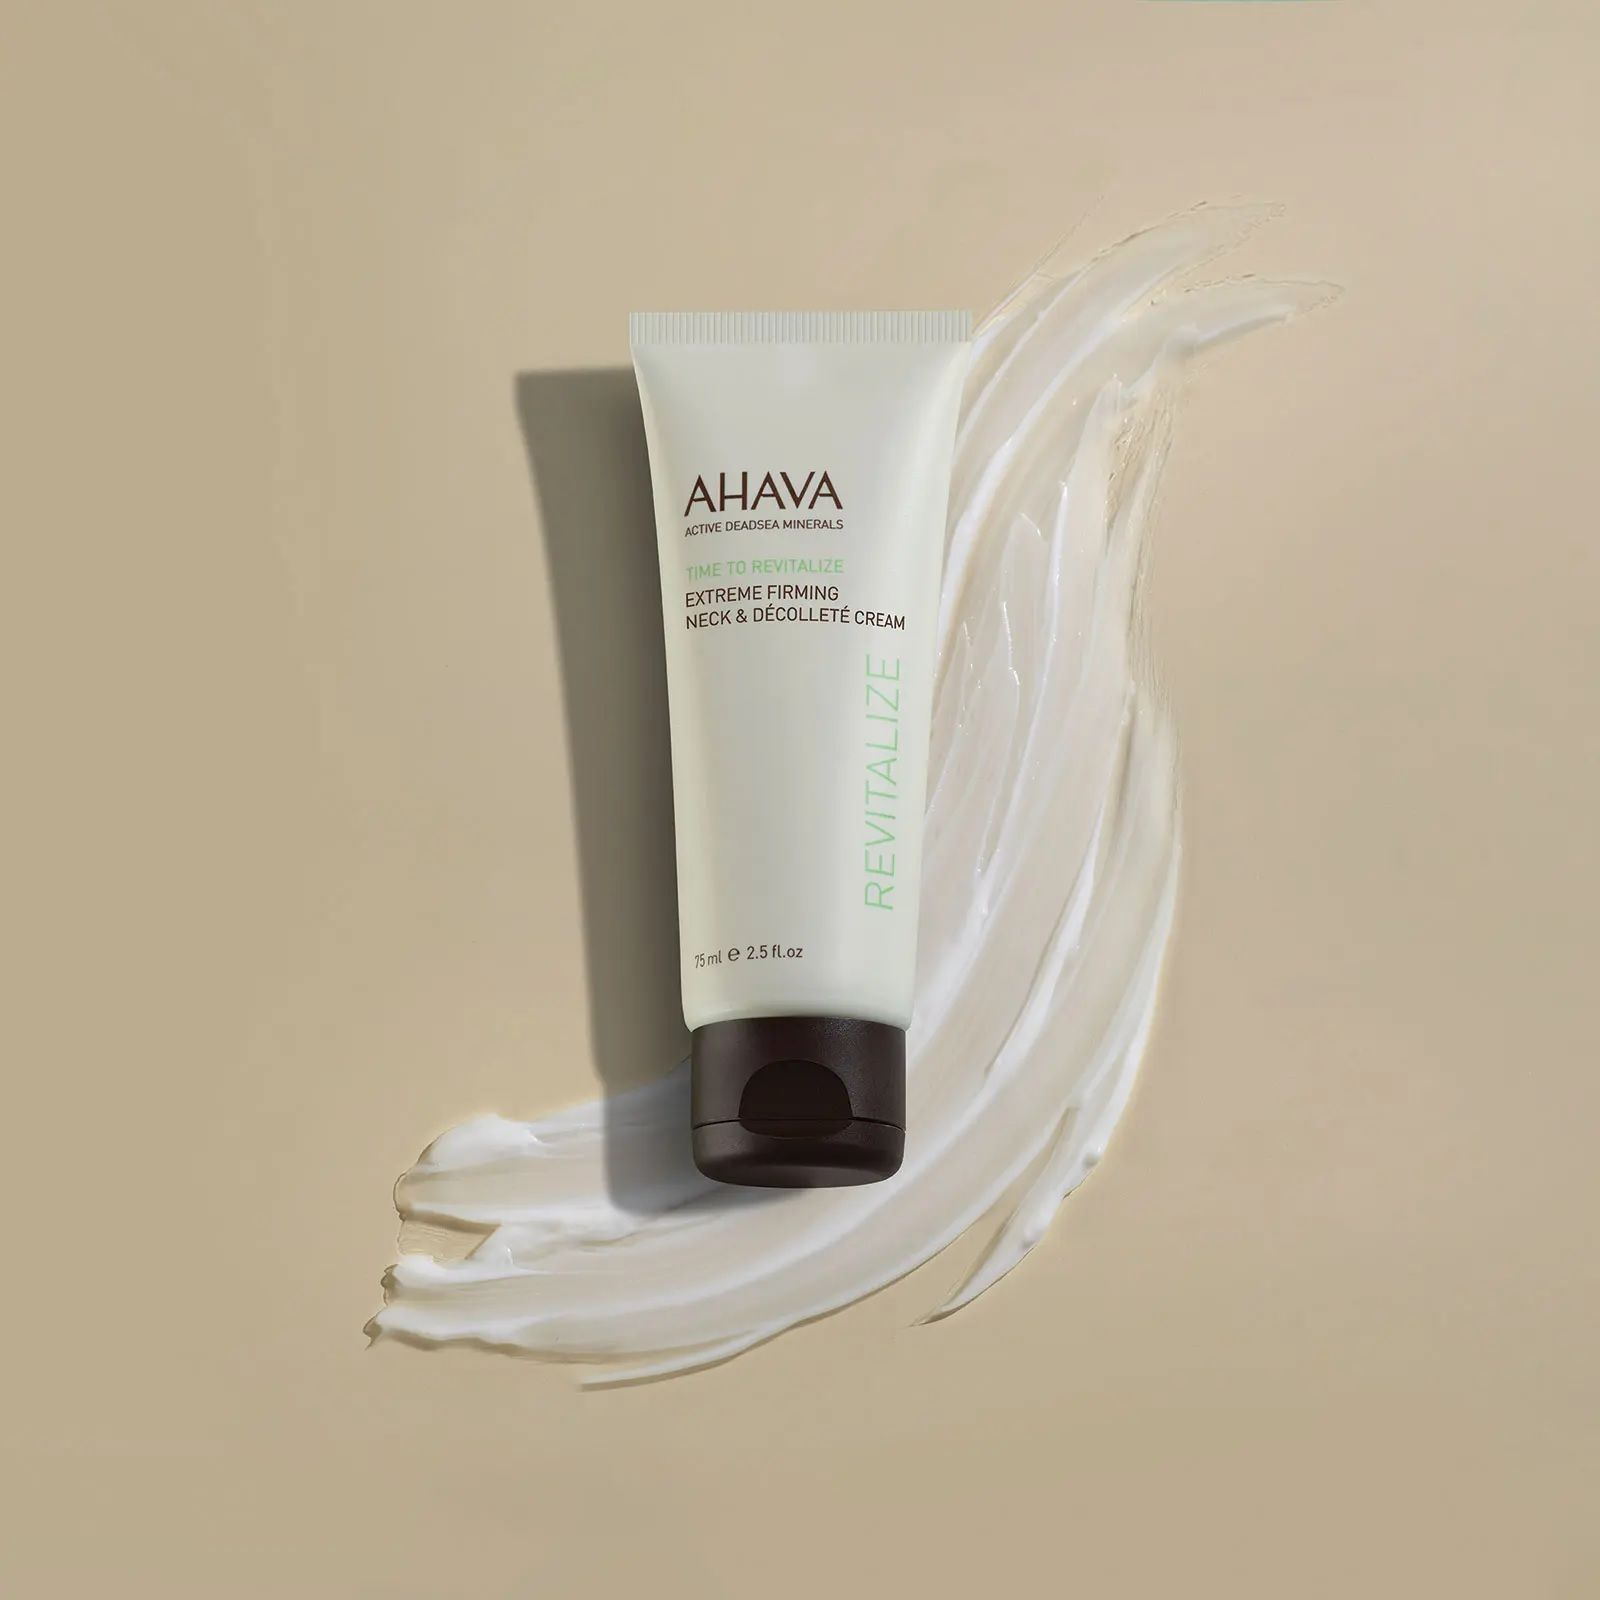 AHAVA Time To Revitalize Extreme Firming Neck & Decollete Cream 75ml